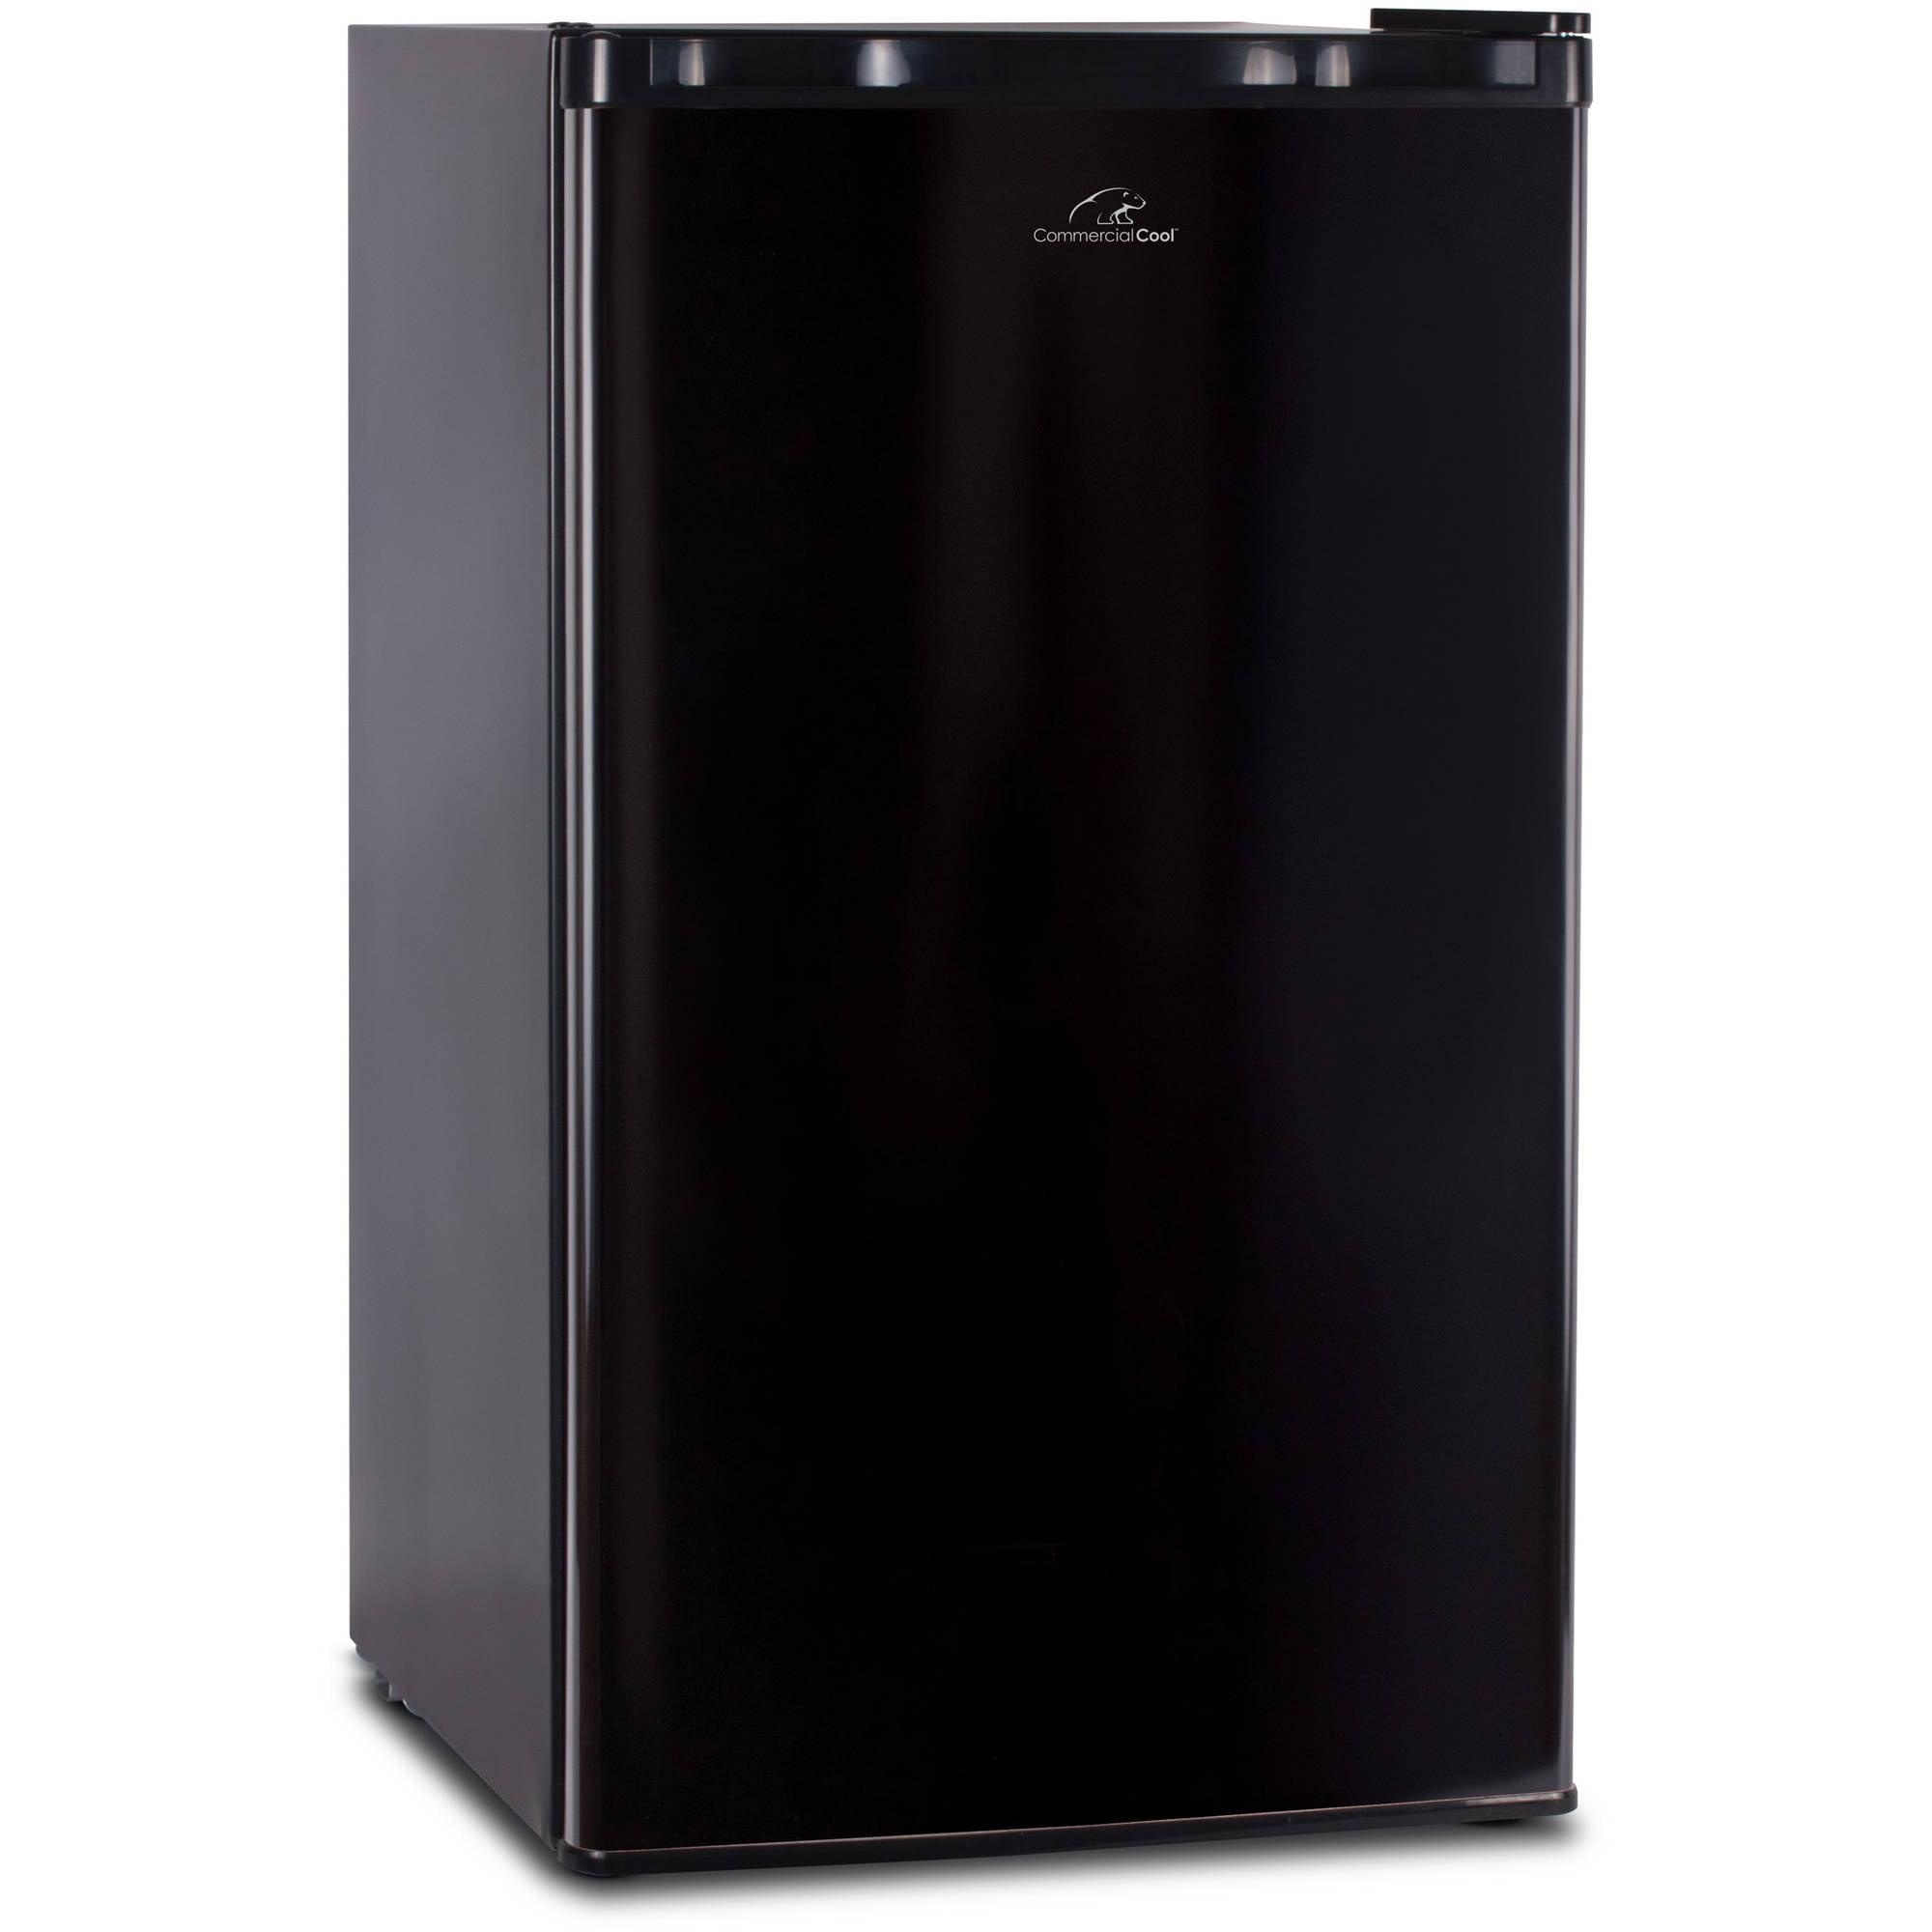 5 0 Cu Ft Mini Fridge: Commerical Cool 1.6 Cu Ft Compact Refrigerator, Black